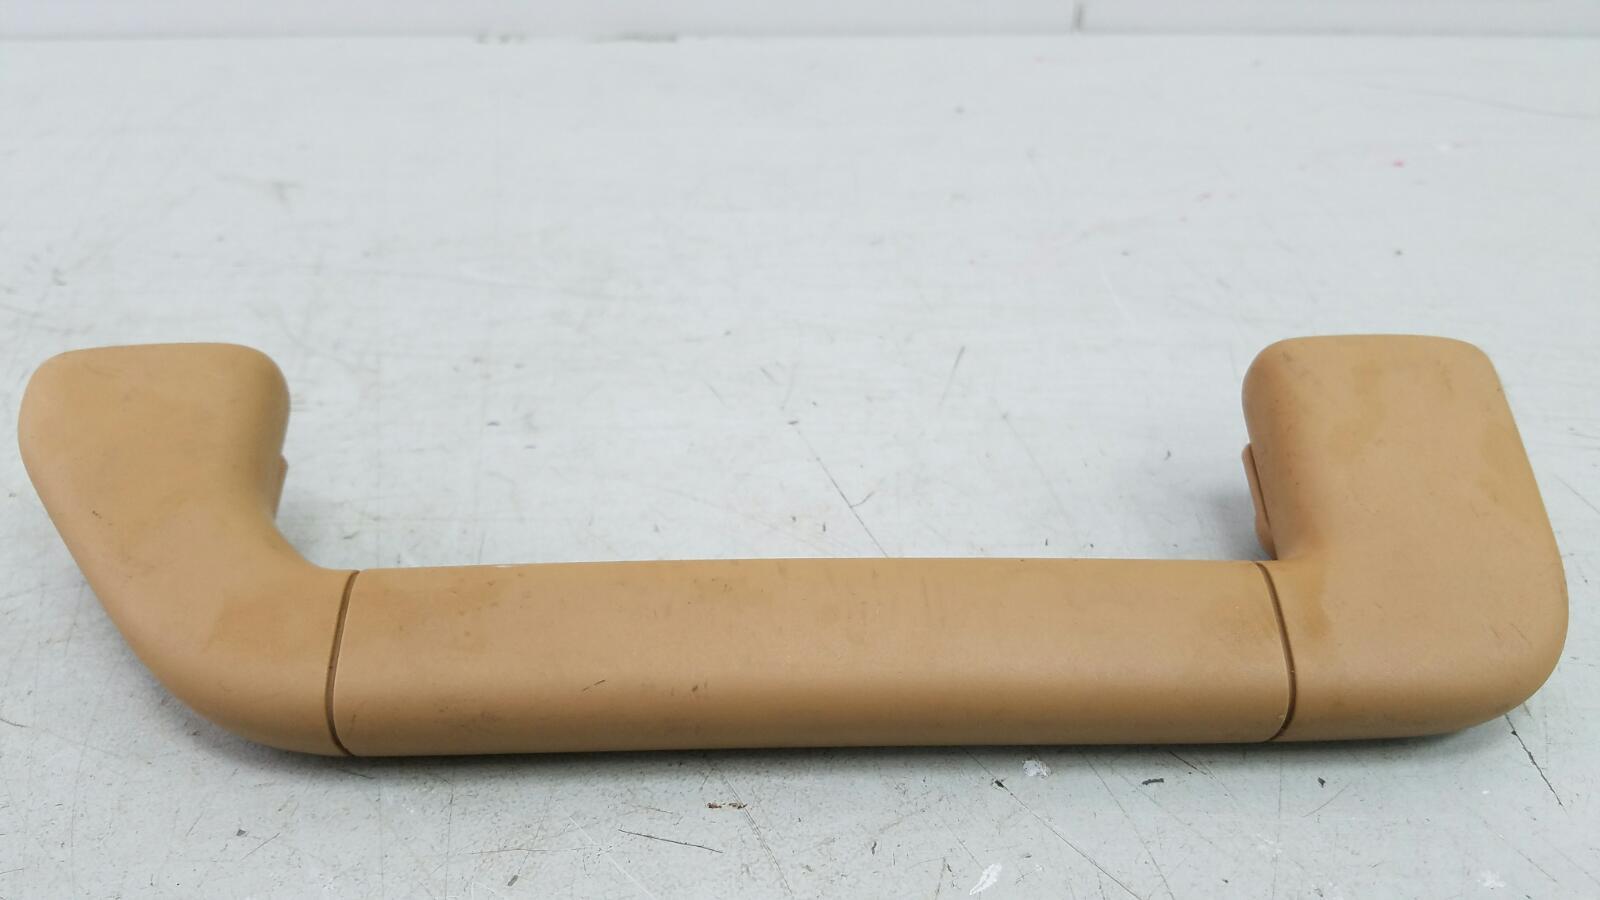 Ручка потолка Porshe Cayenne 955 BMV M02.2Y 3.2Л 2005 передняя правая